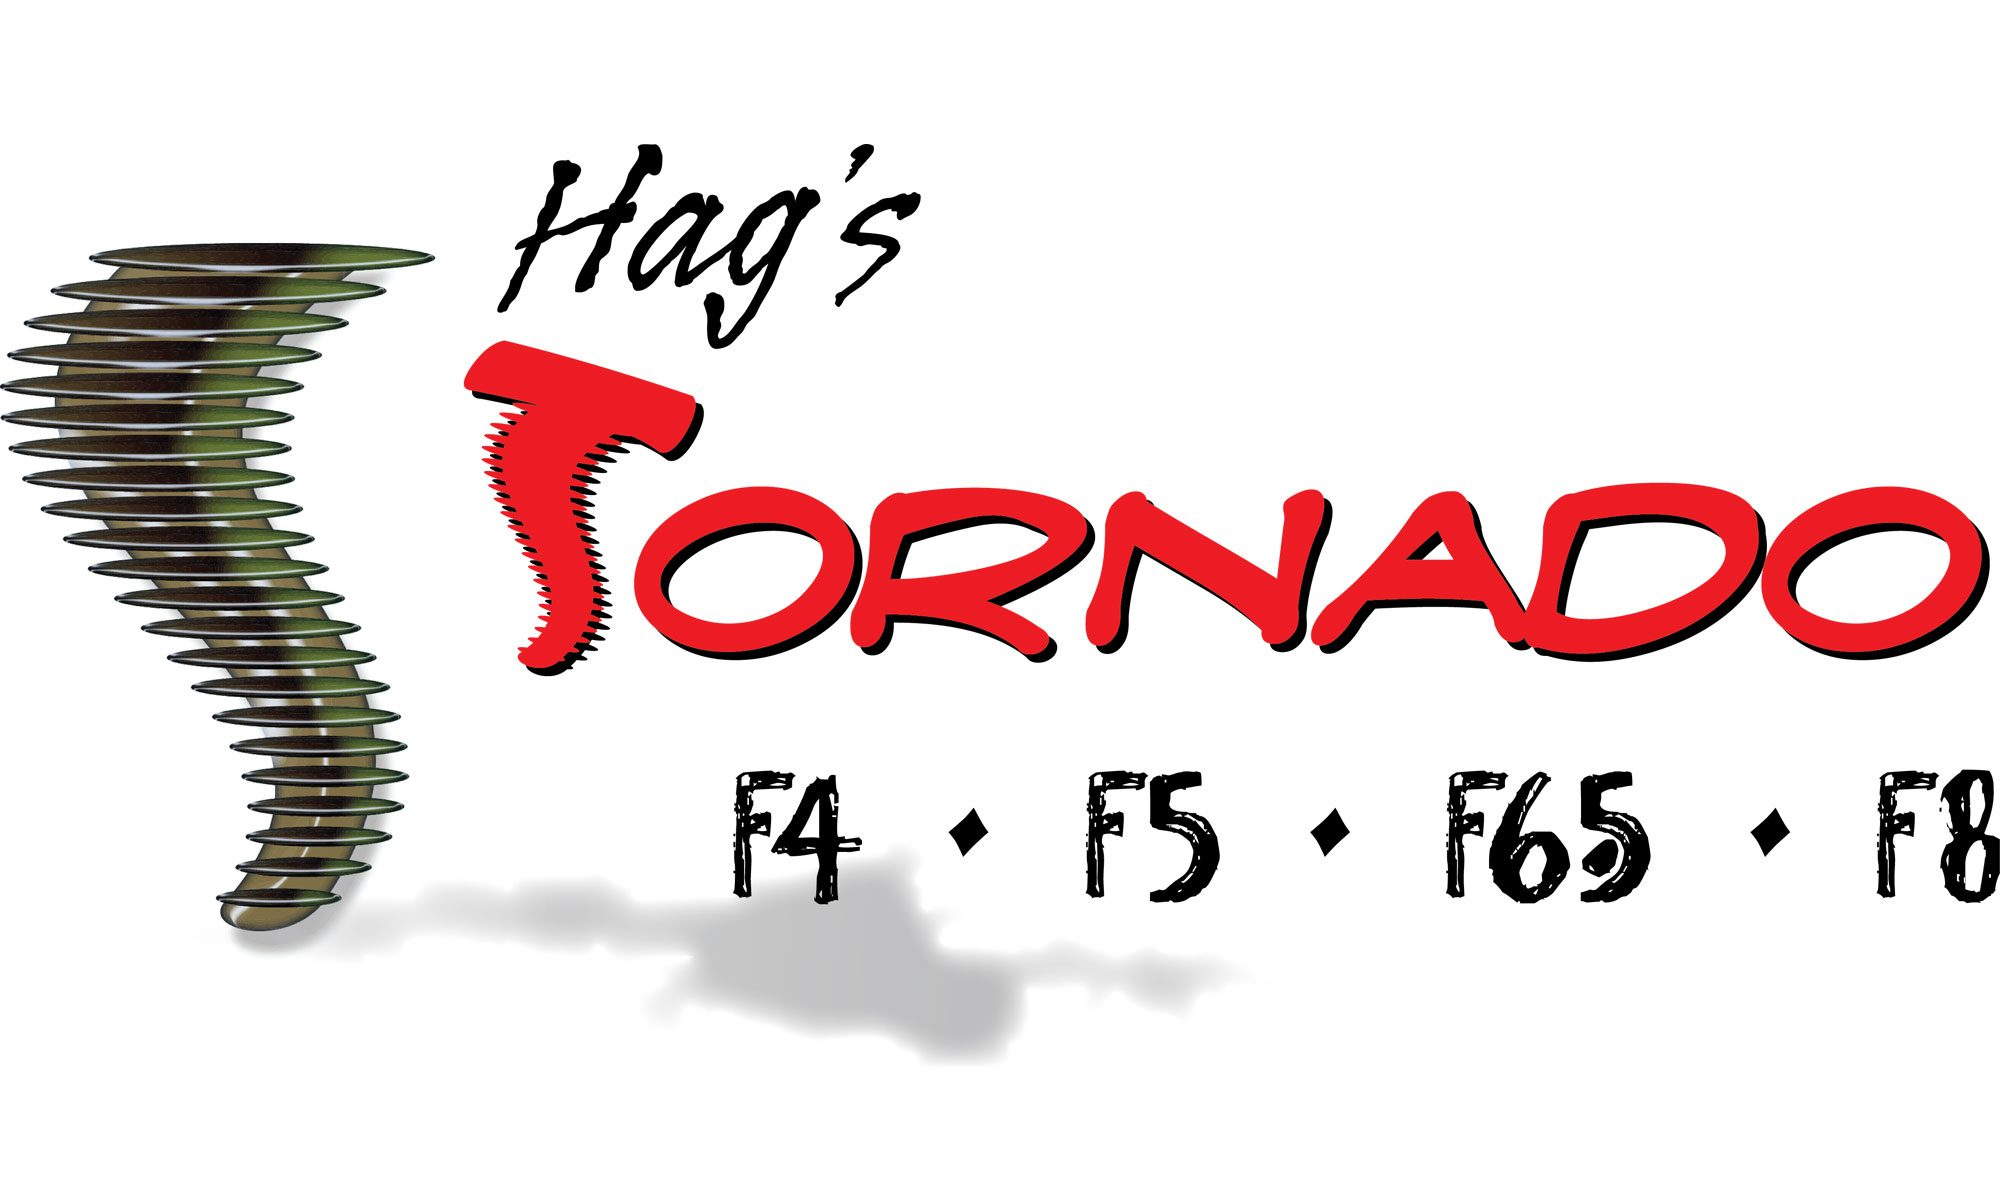 Hag's Tornado Bait